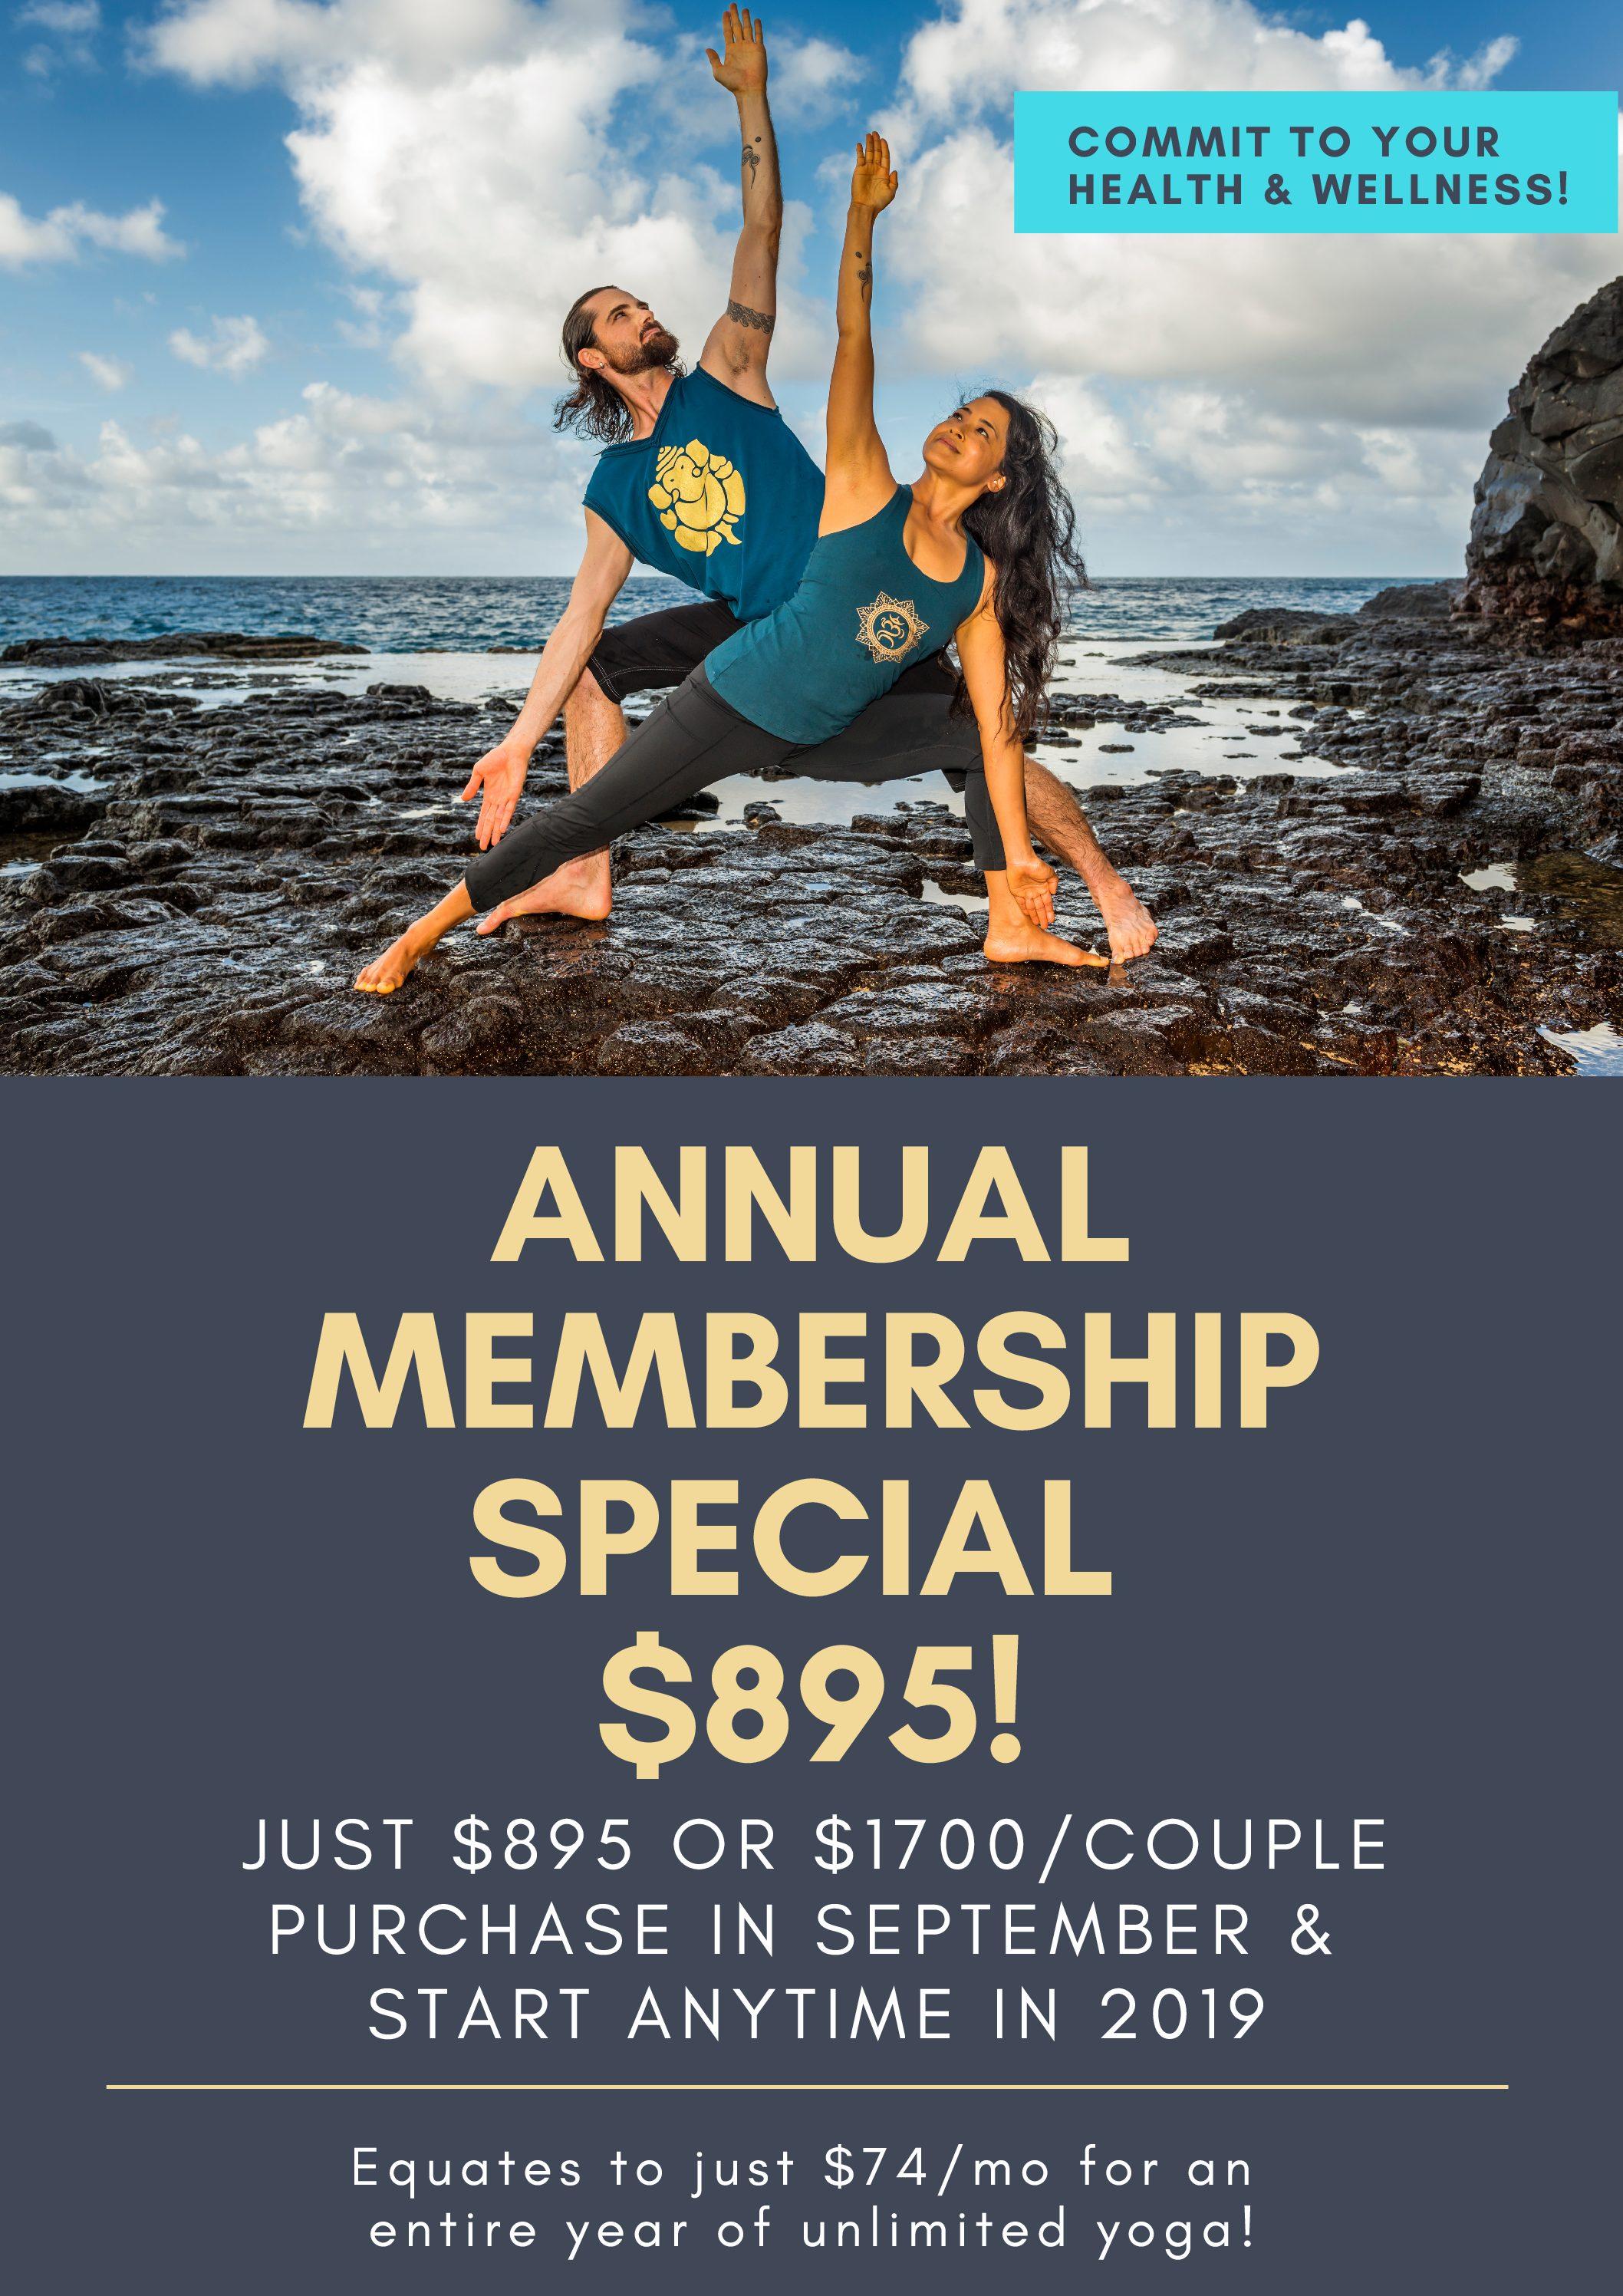 Annual Membership Special